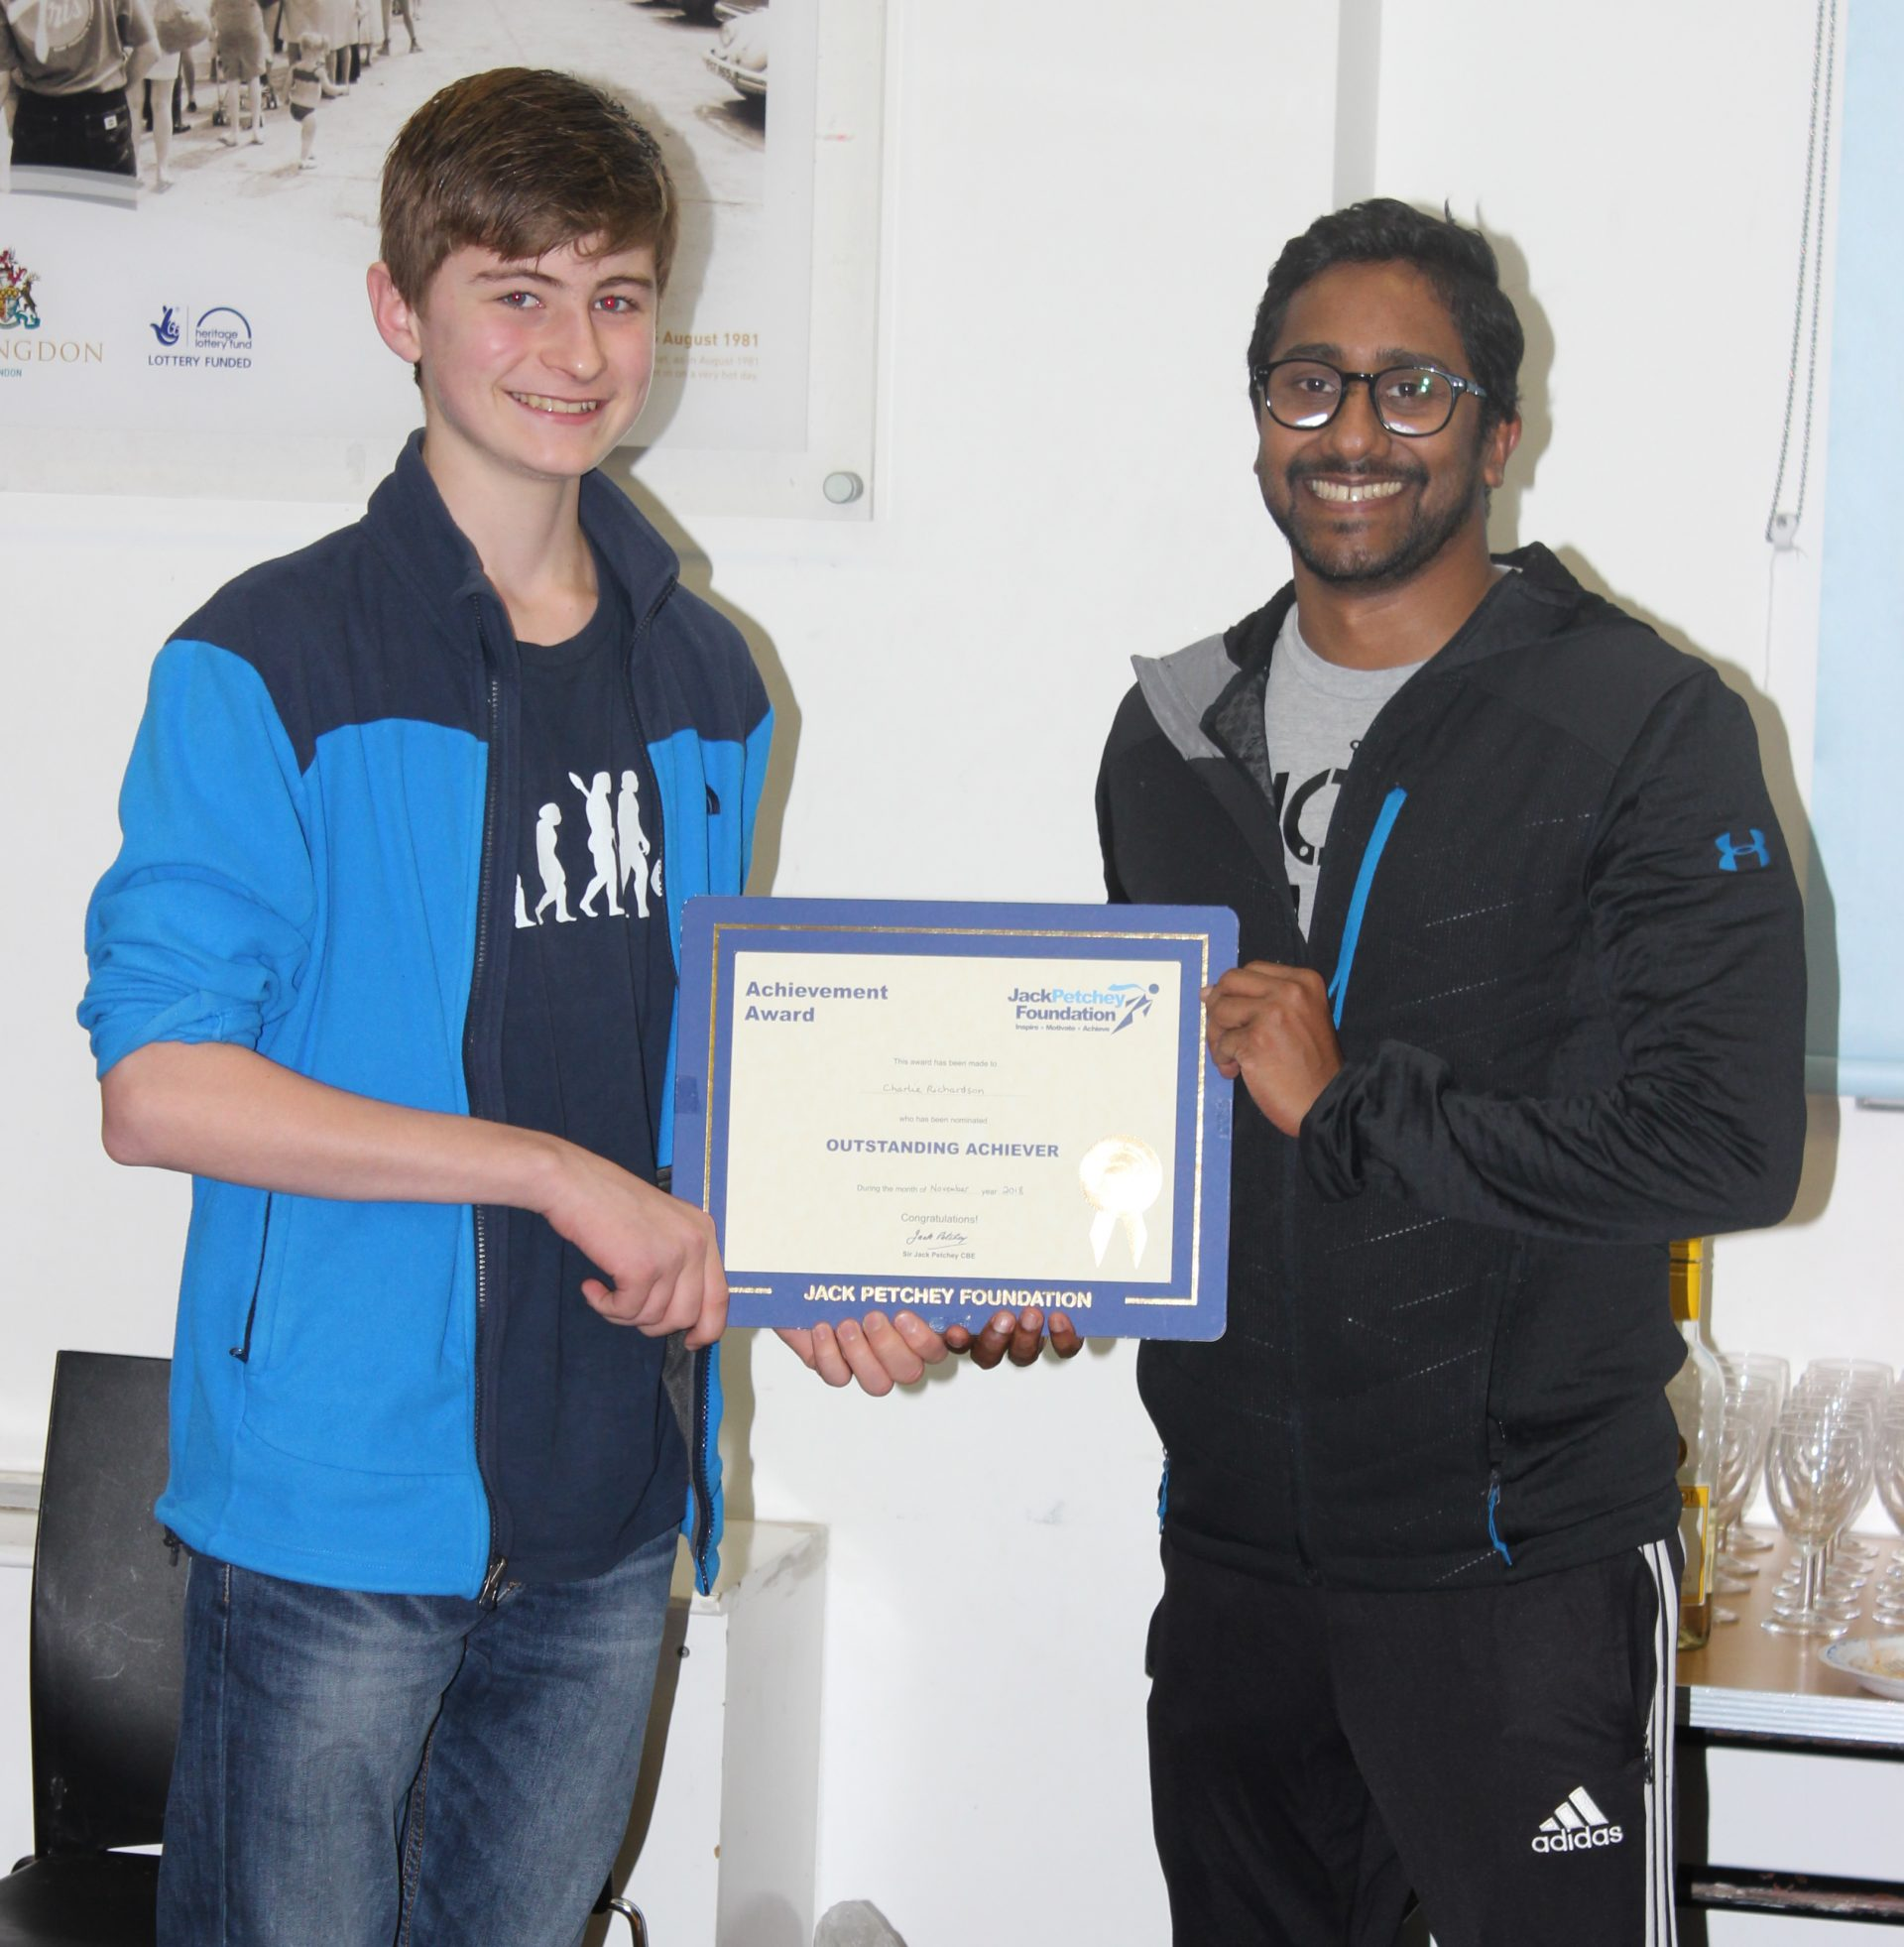 Charlie receiving his award from coach Aloka.